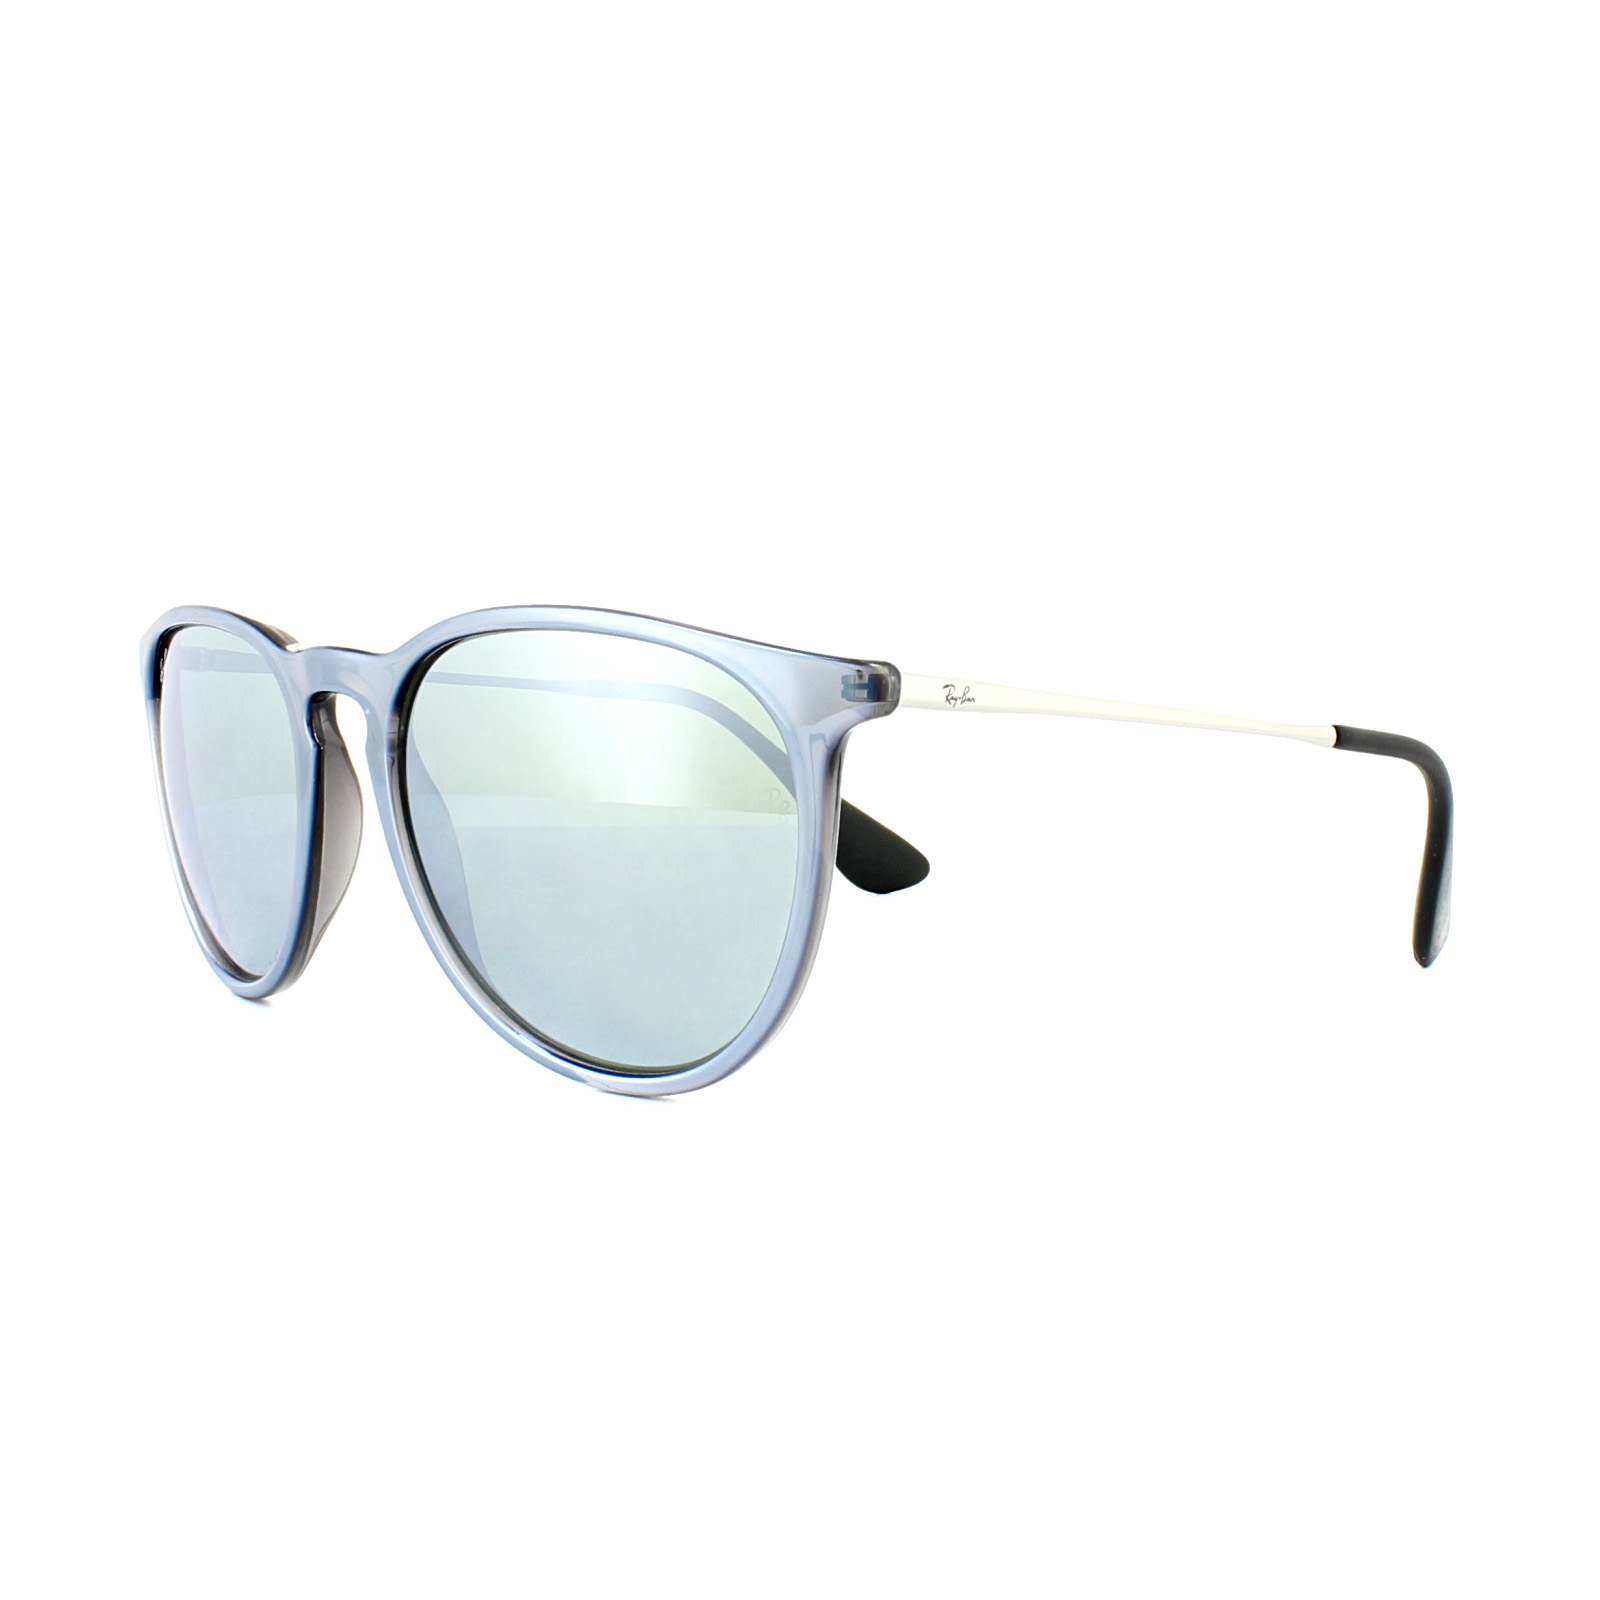 306b7503dc6c5f ... sale sentinel ray ban sunglasses erika 4171 631930 grey silver silver  mirror cc22b a22d1